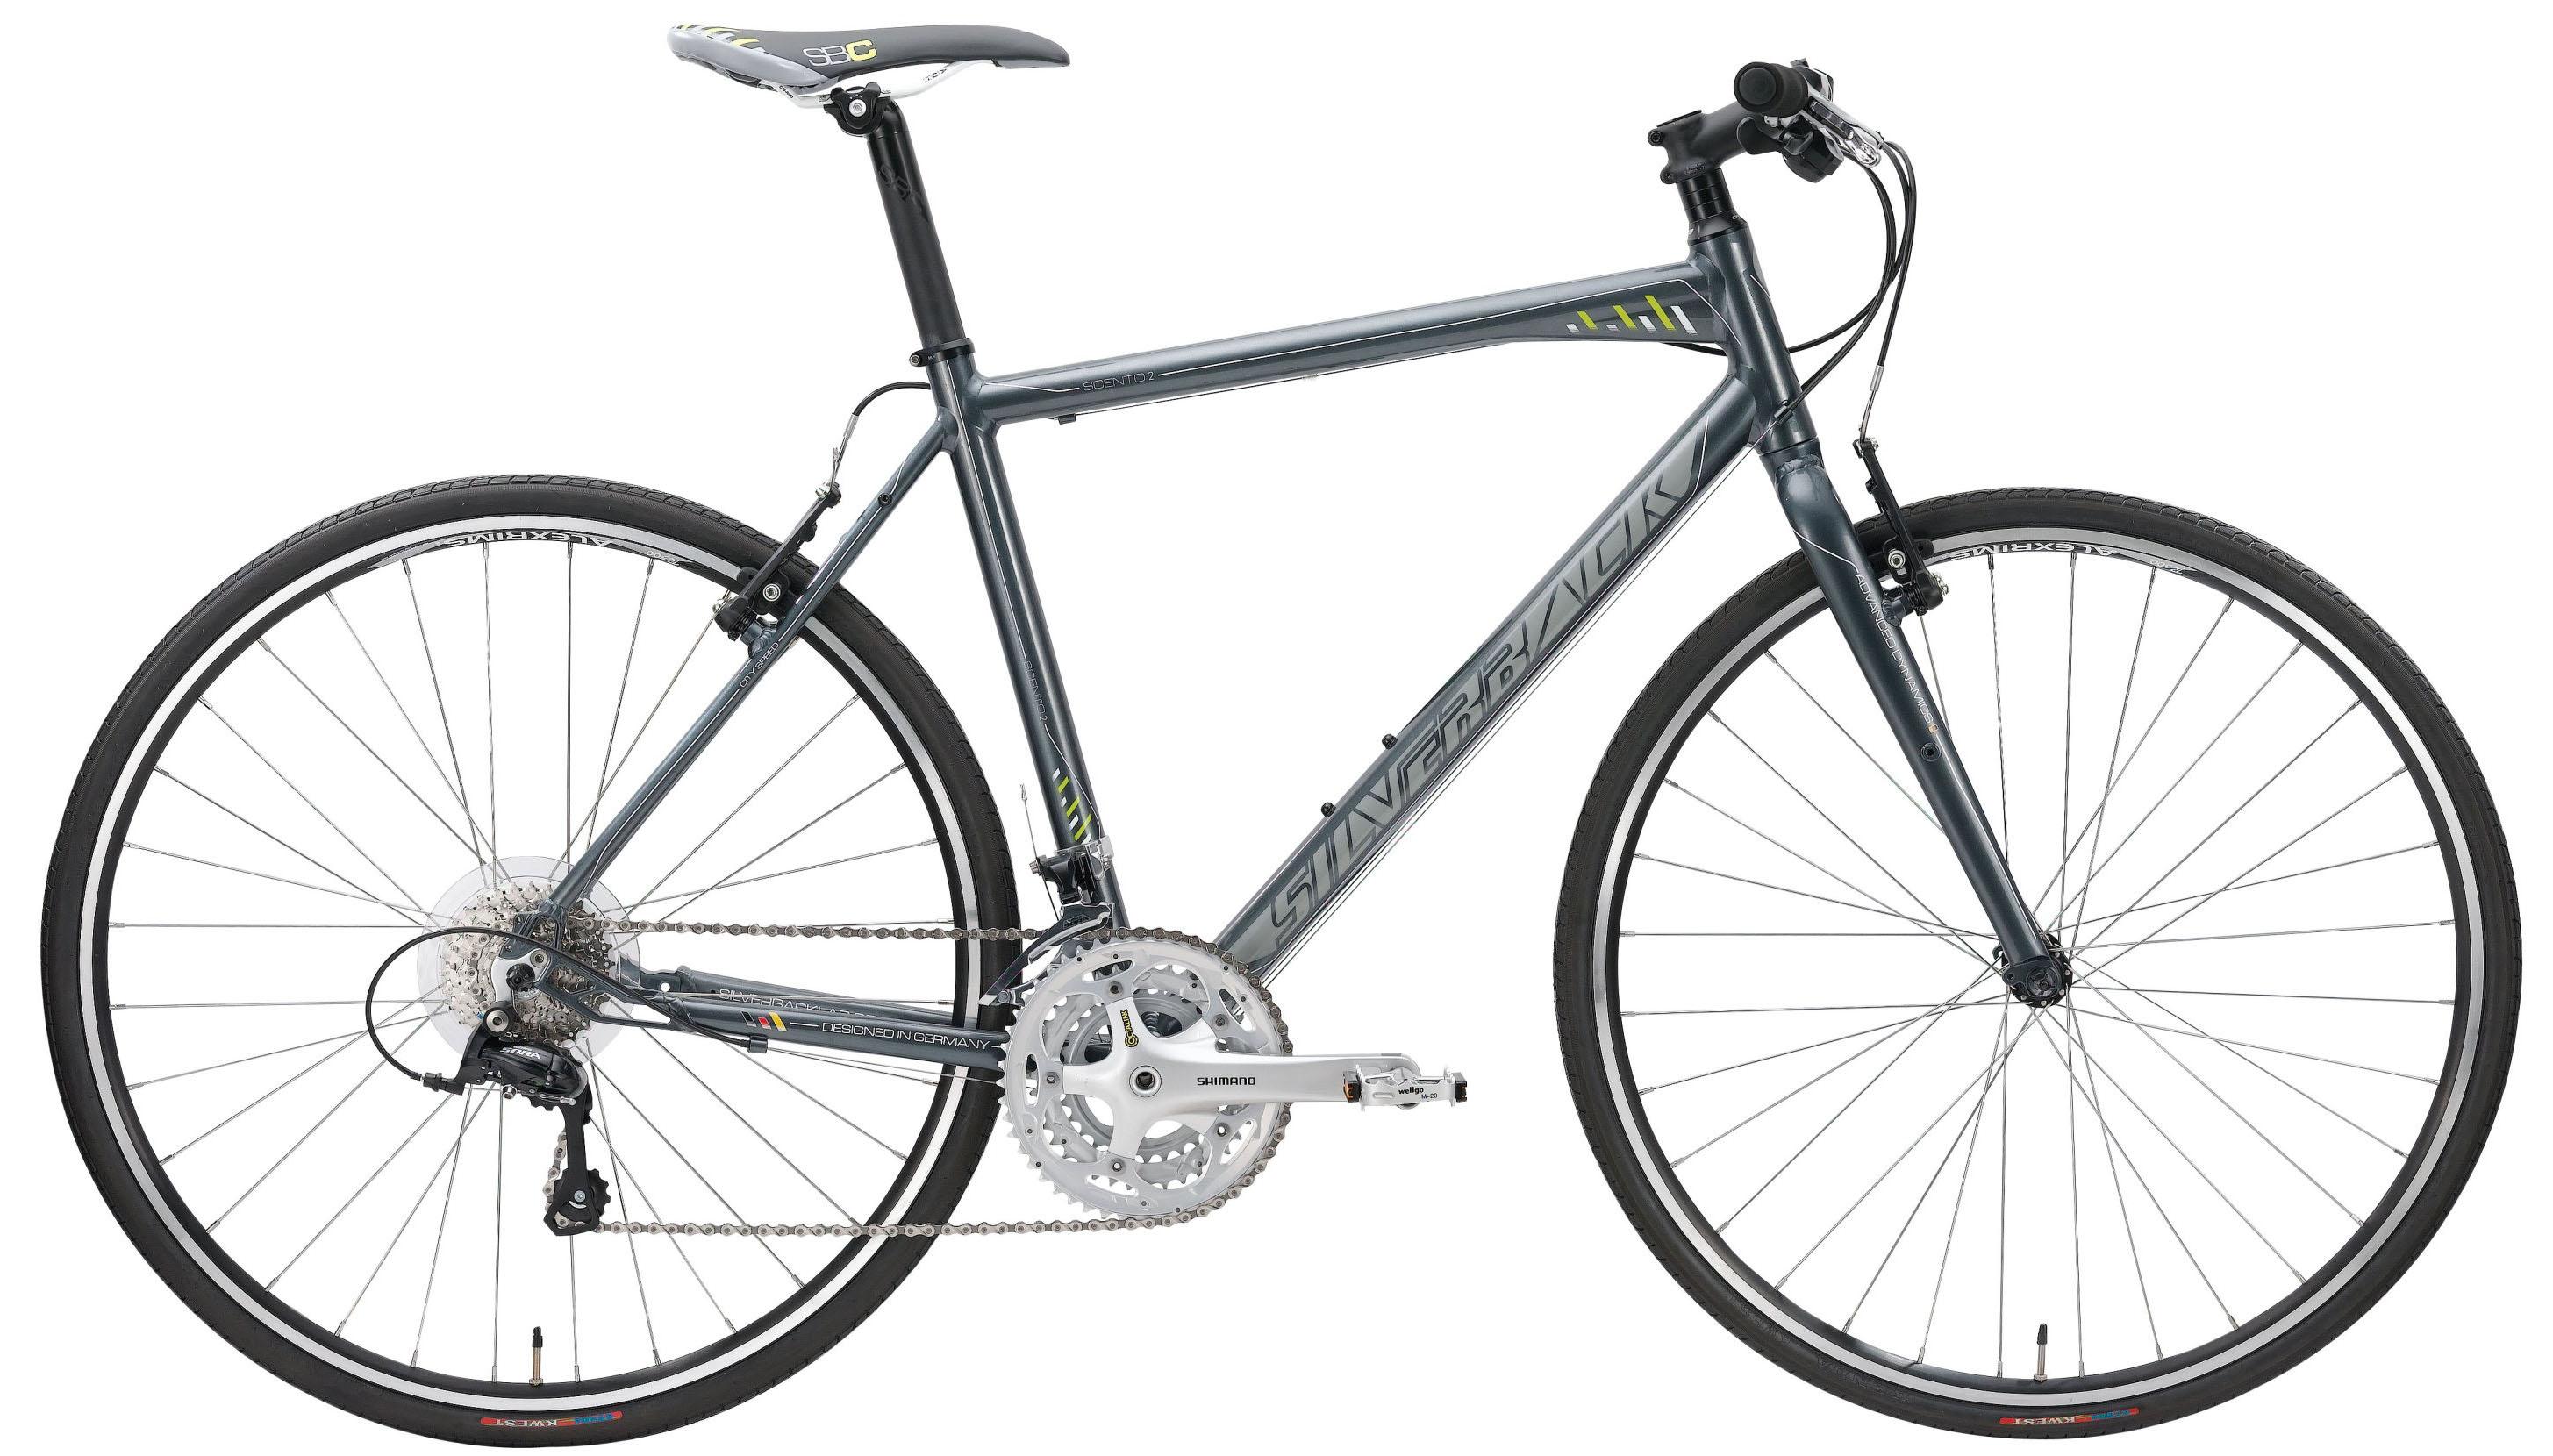 Фото - Велосипед Silverback Scento 2 2015 велосипед silverback scento 2 2015